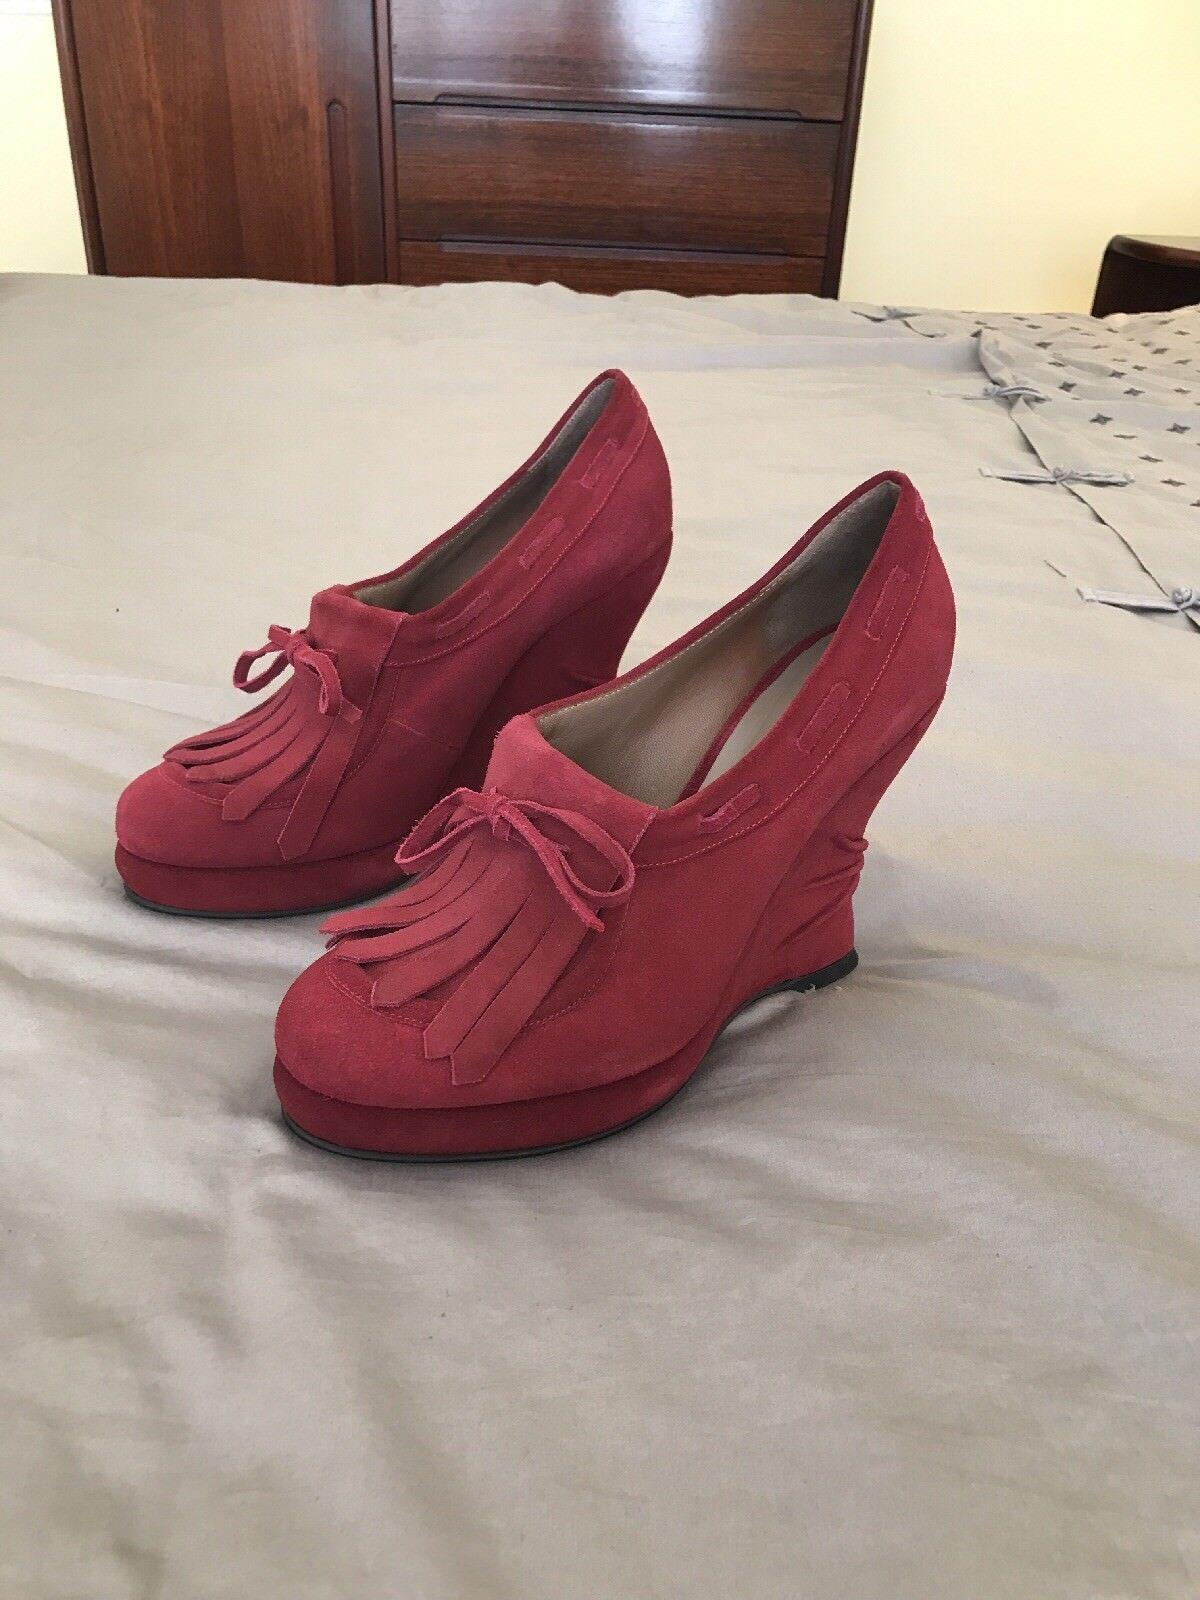 BOTTEGA VENETA  960 burgundy suede Wedges Pumps Shoes EU 40 US 9.5 MADE IN ITALY